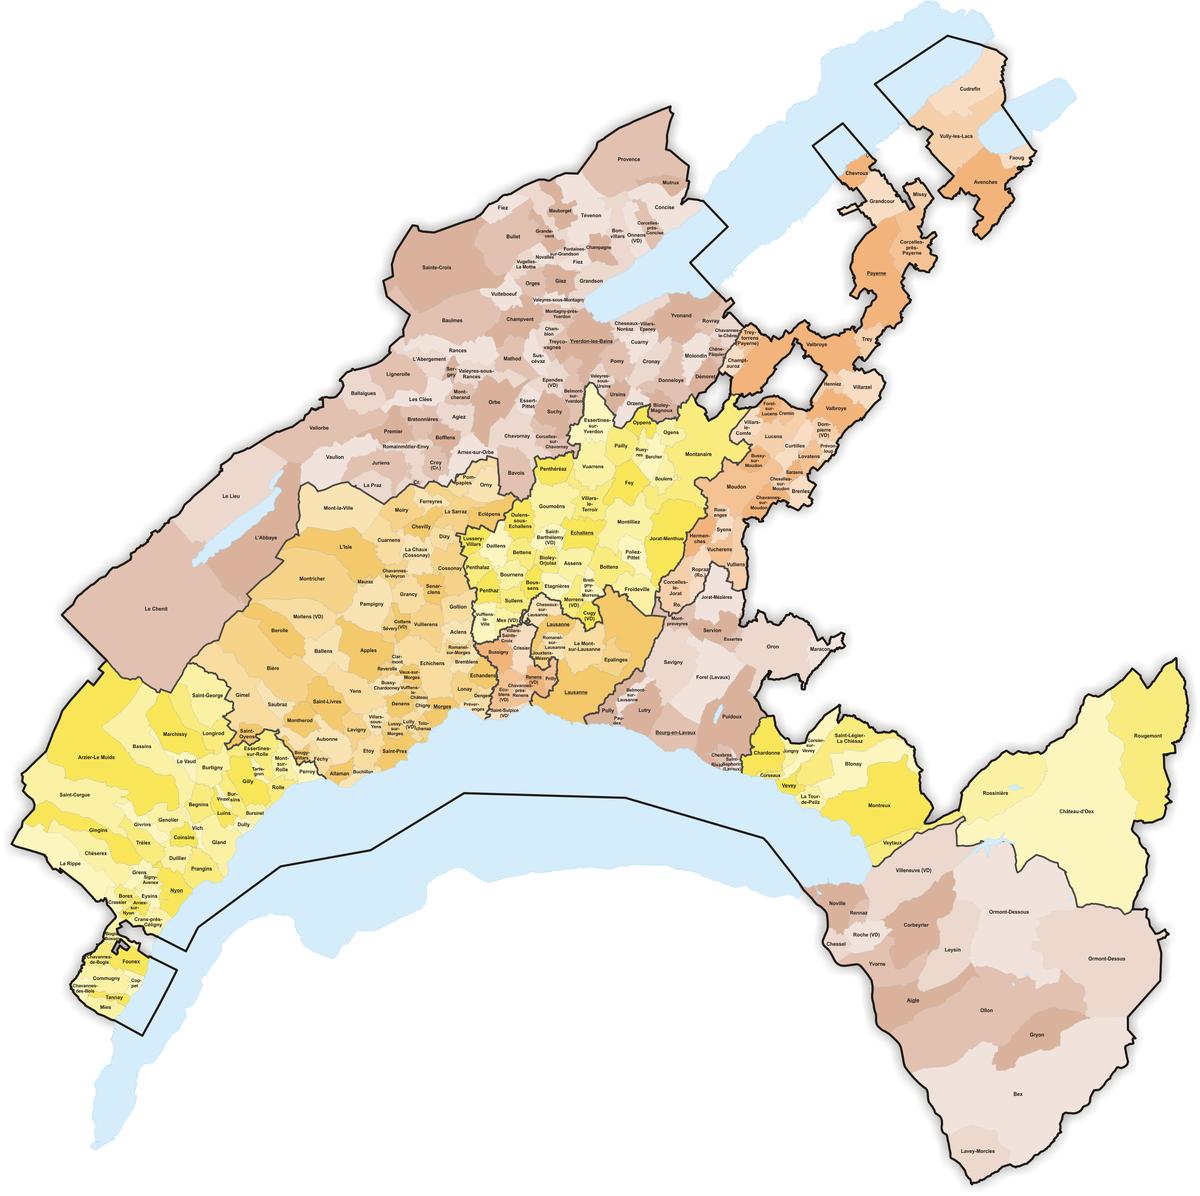 Municipalities of the canton of Vaud.